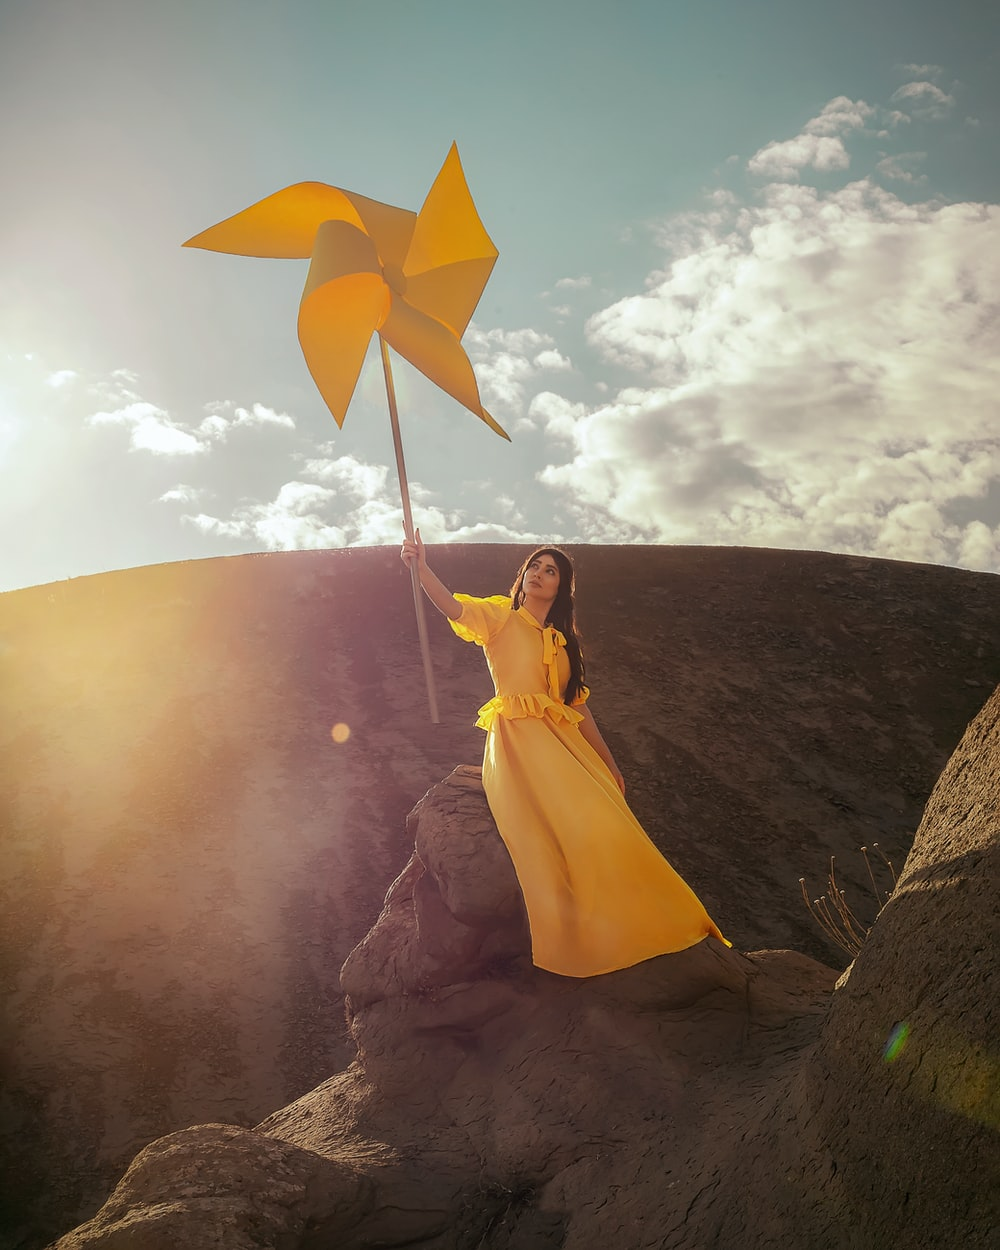 woman in yellow dress holding yellow umbrella